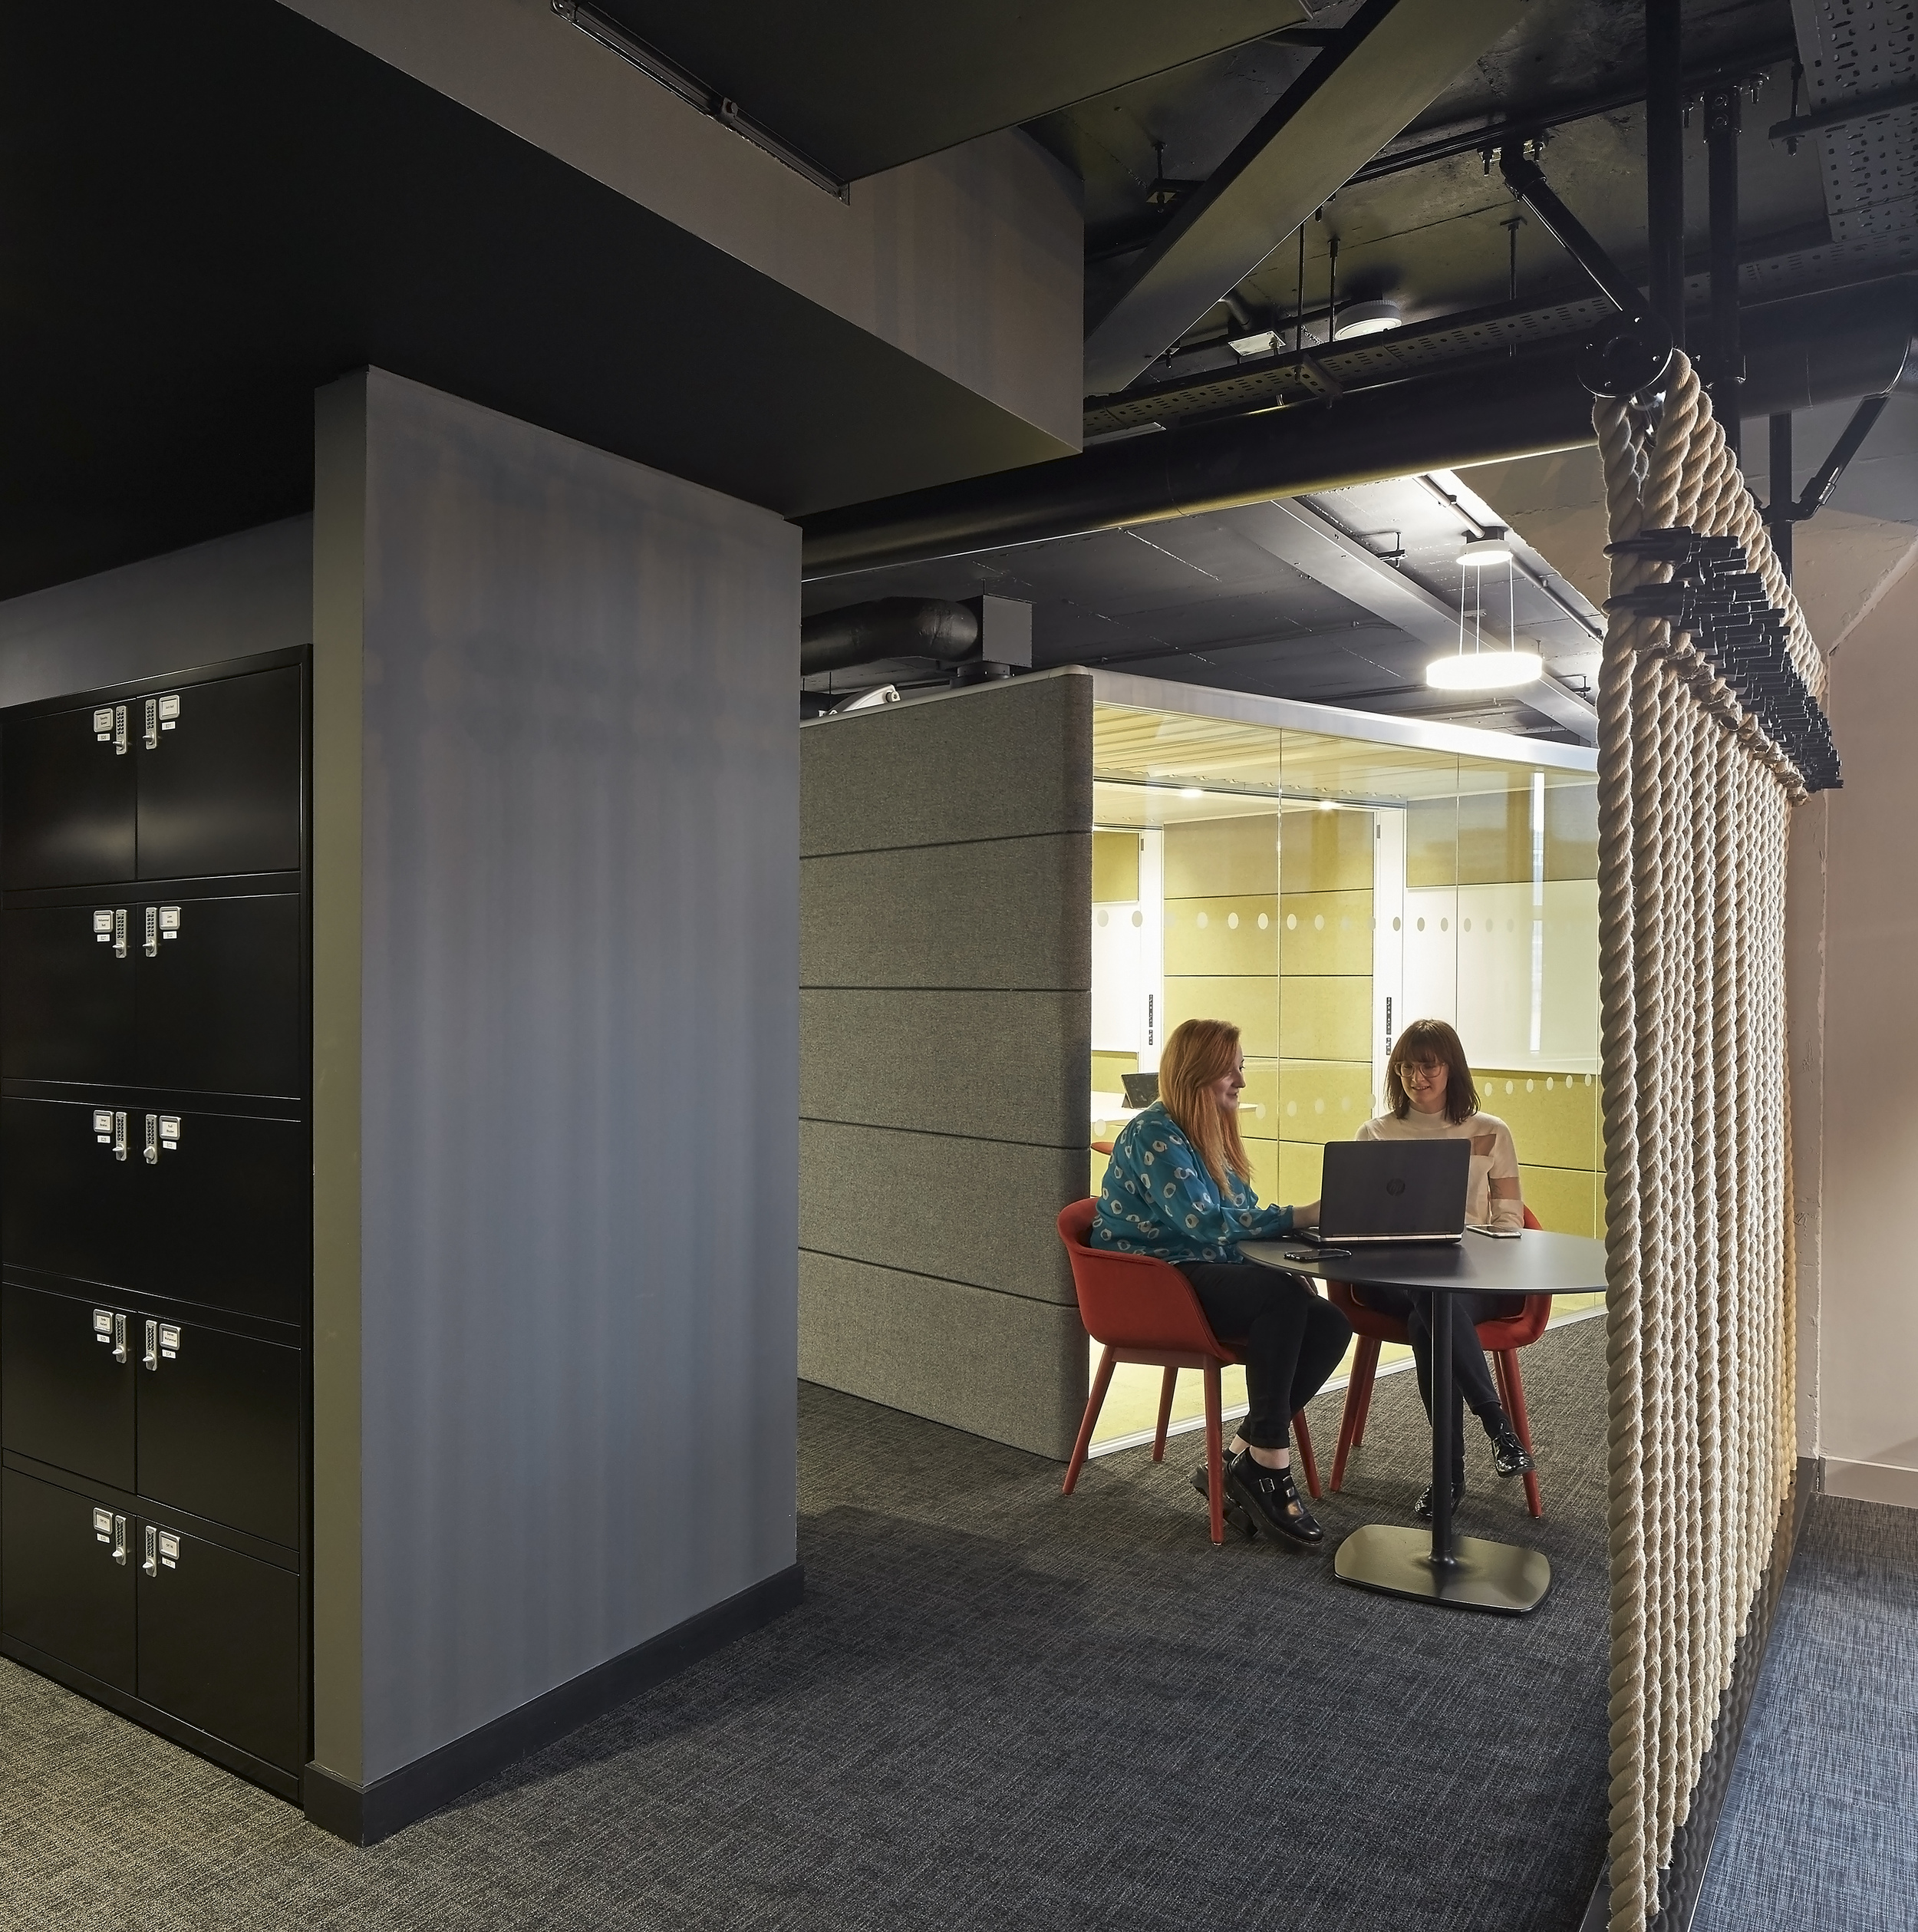 HLW_SKY offices_Brick Lane_-®Hufton+Crow_011.jpg